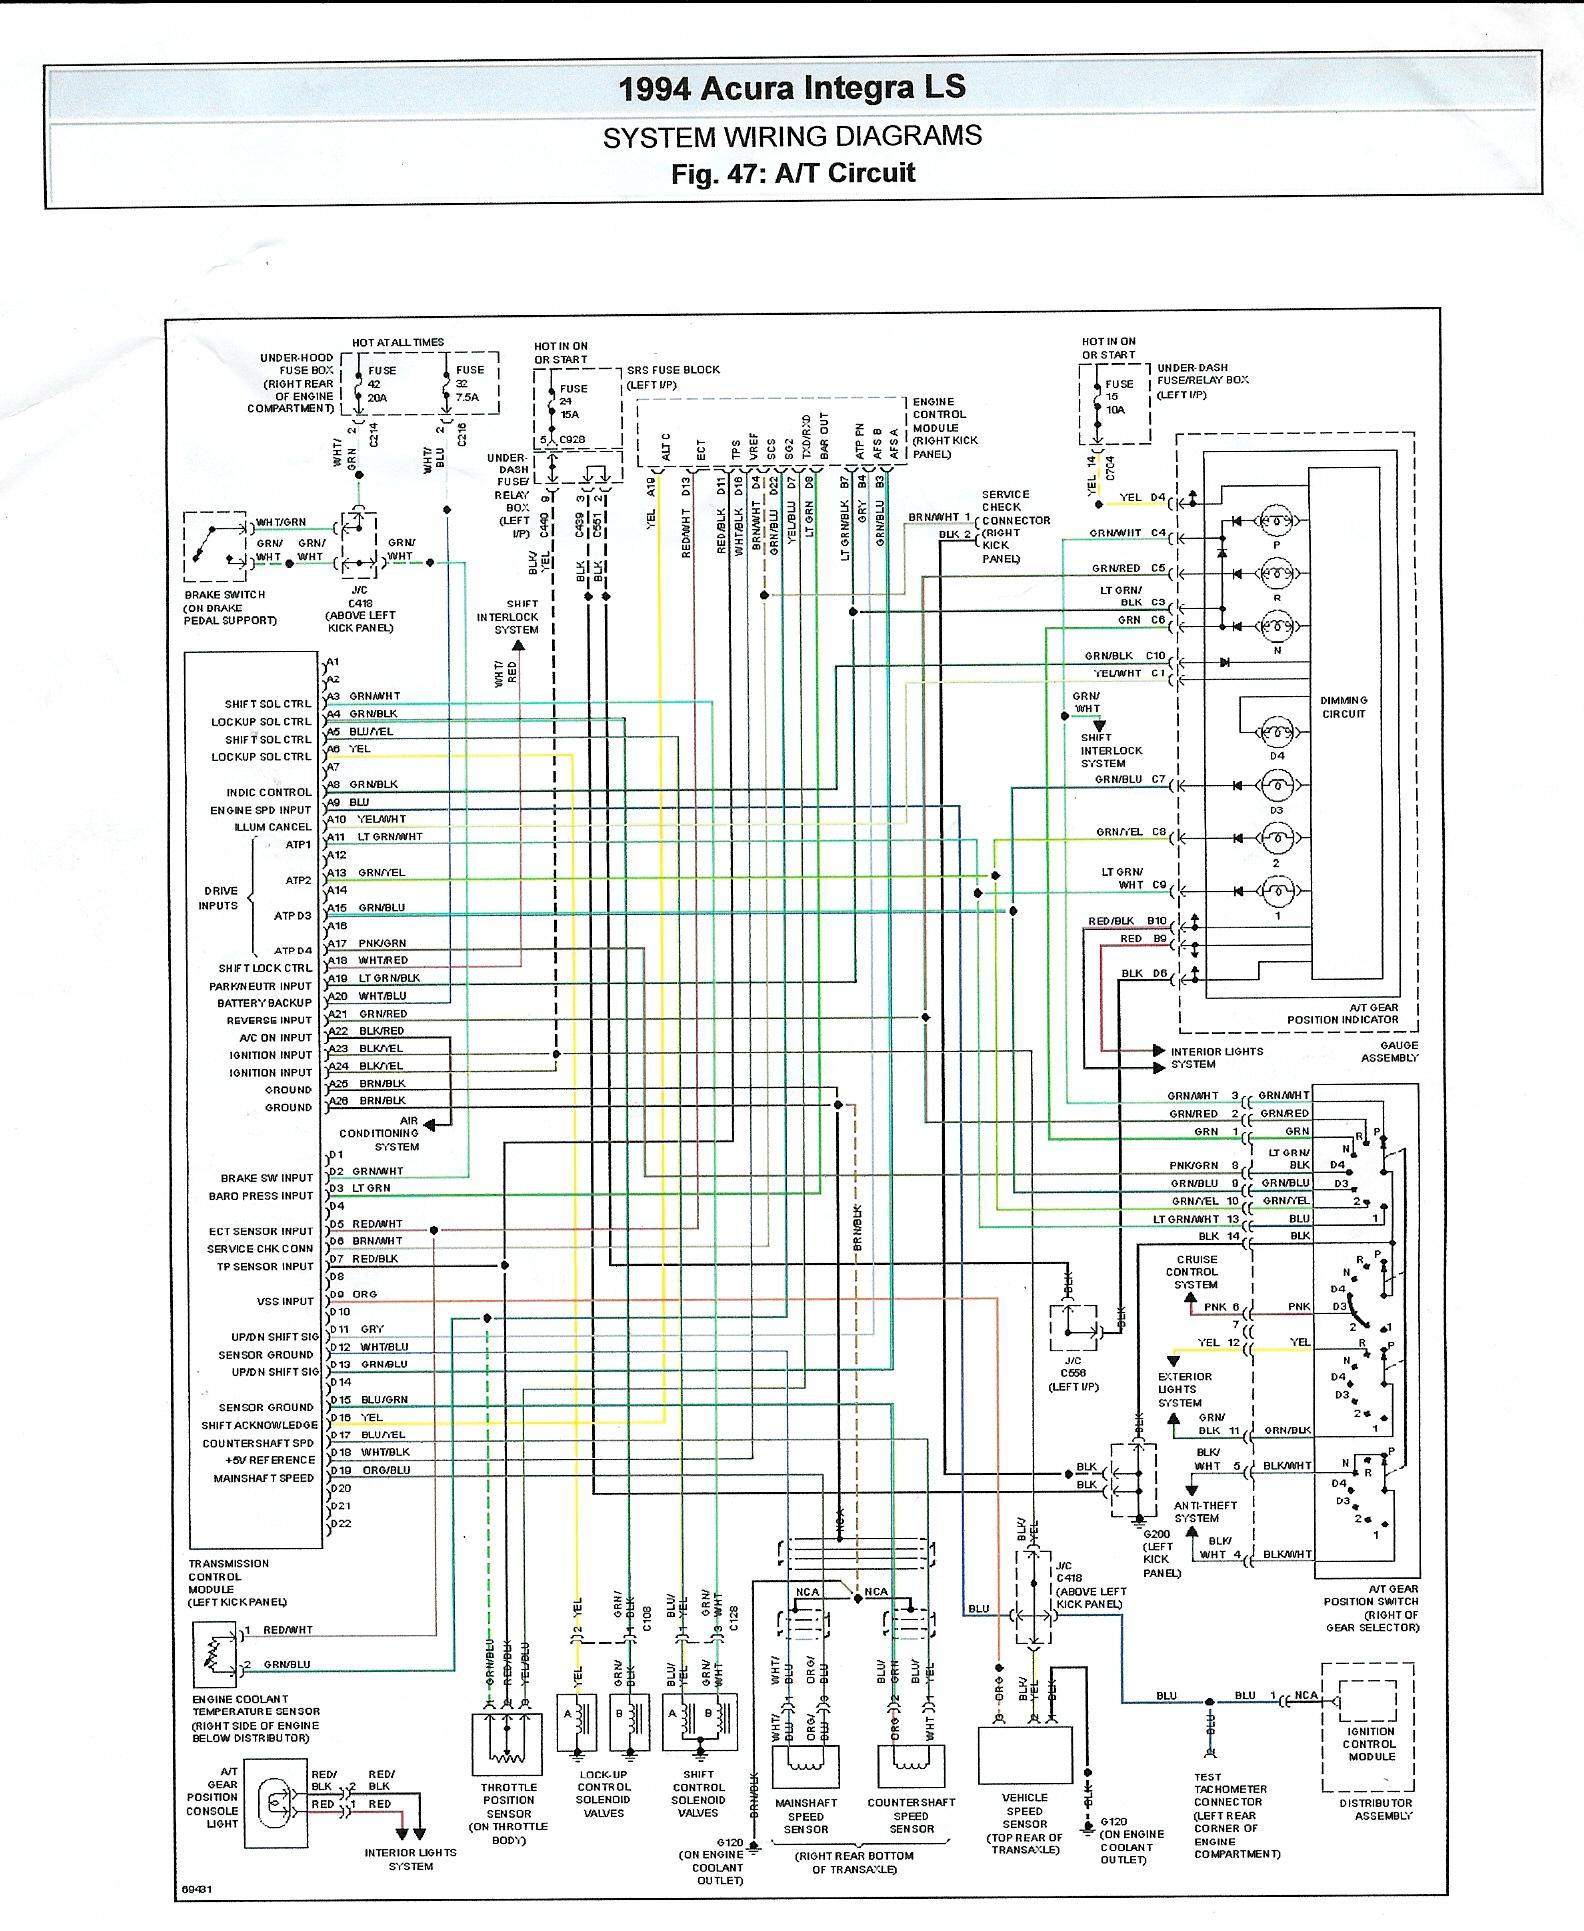 Admirable Honda Civic Wiring Diagram For 89 Wiring Diagram Tutorial Wiring Cloud Ittabpendurdonanfuldomelitekicepsianuembamohammedshrineorg